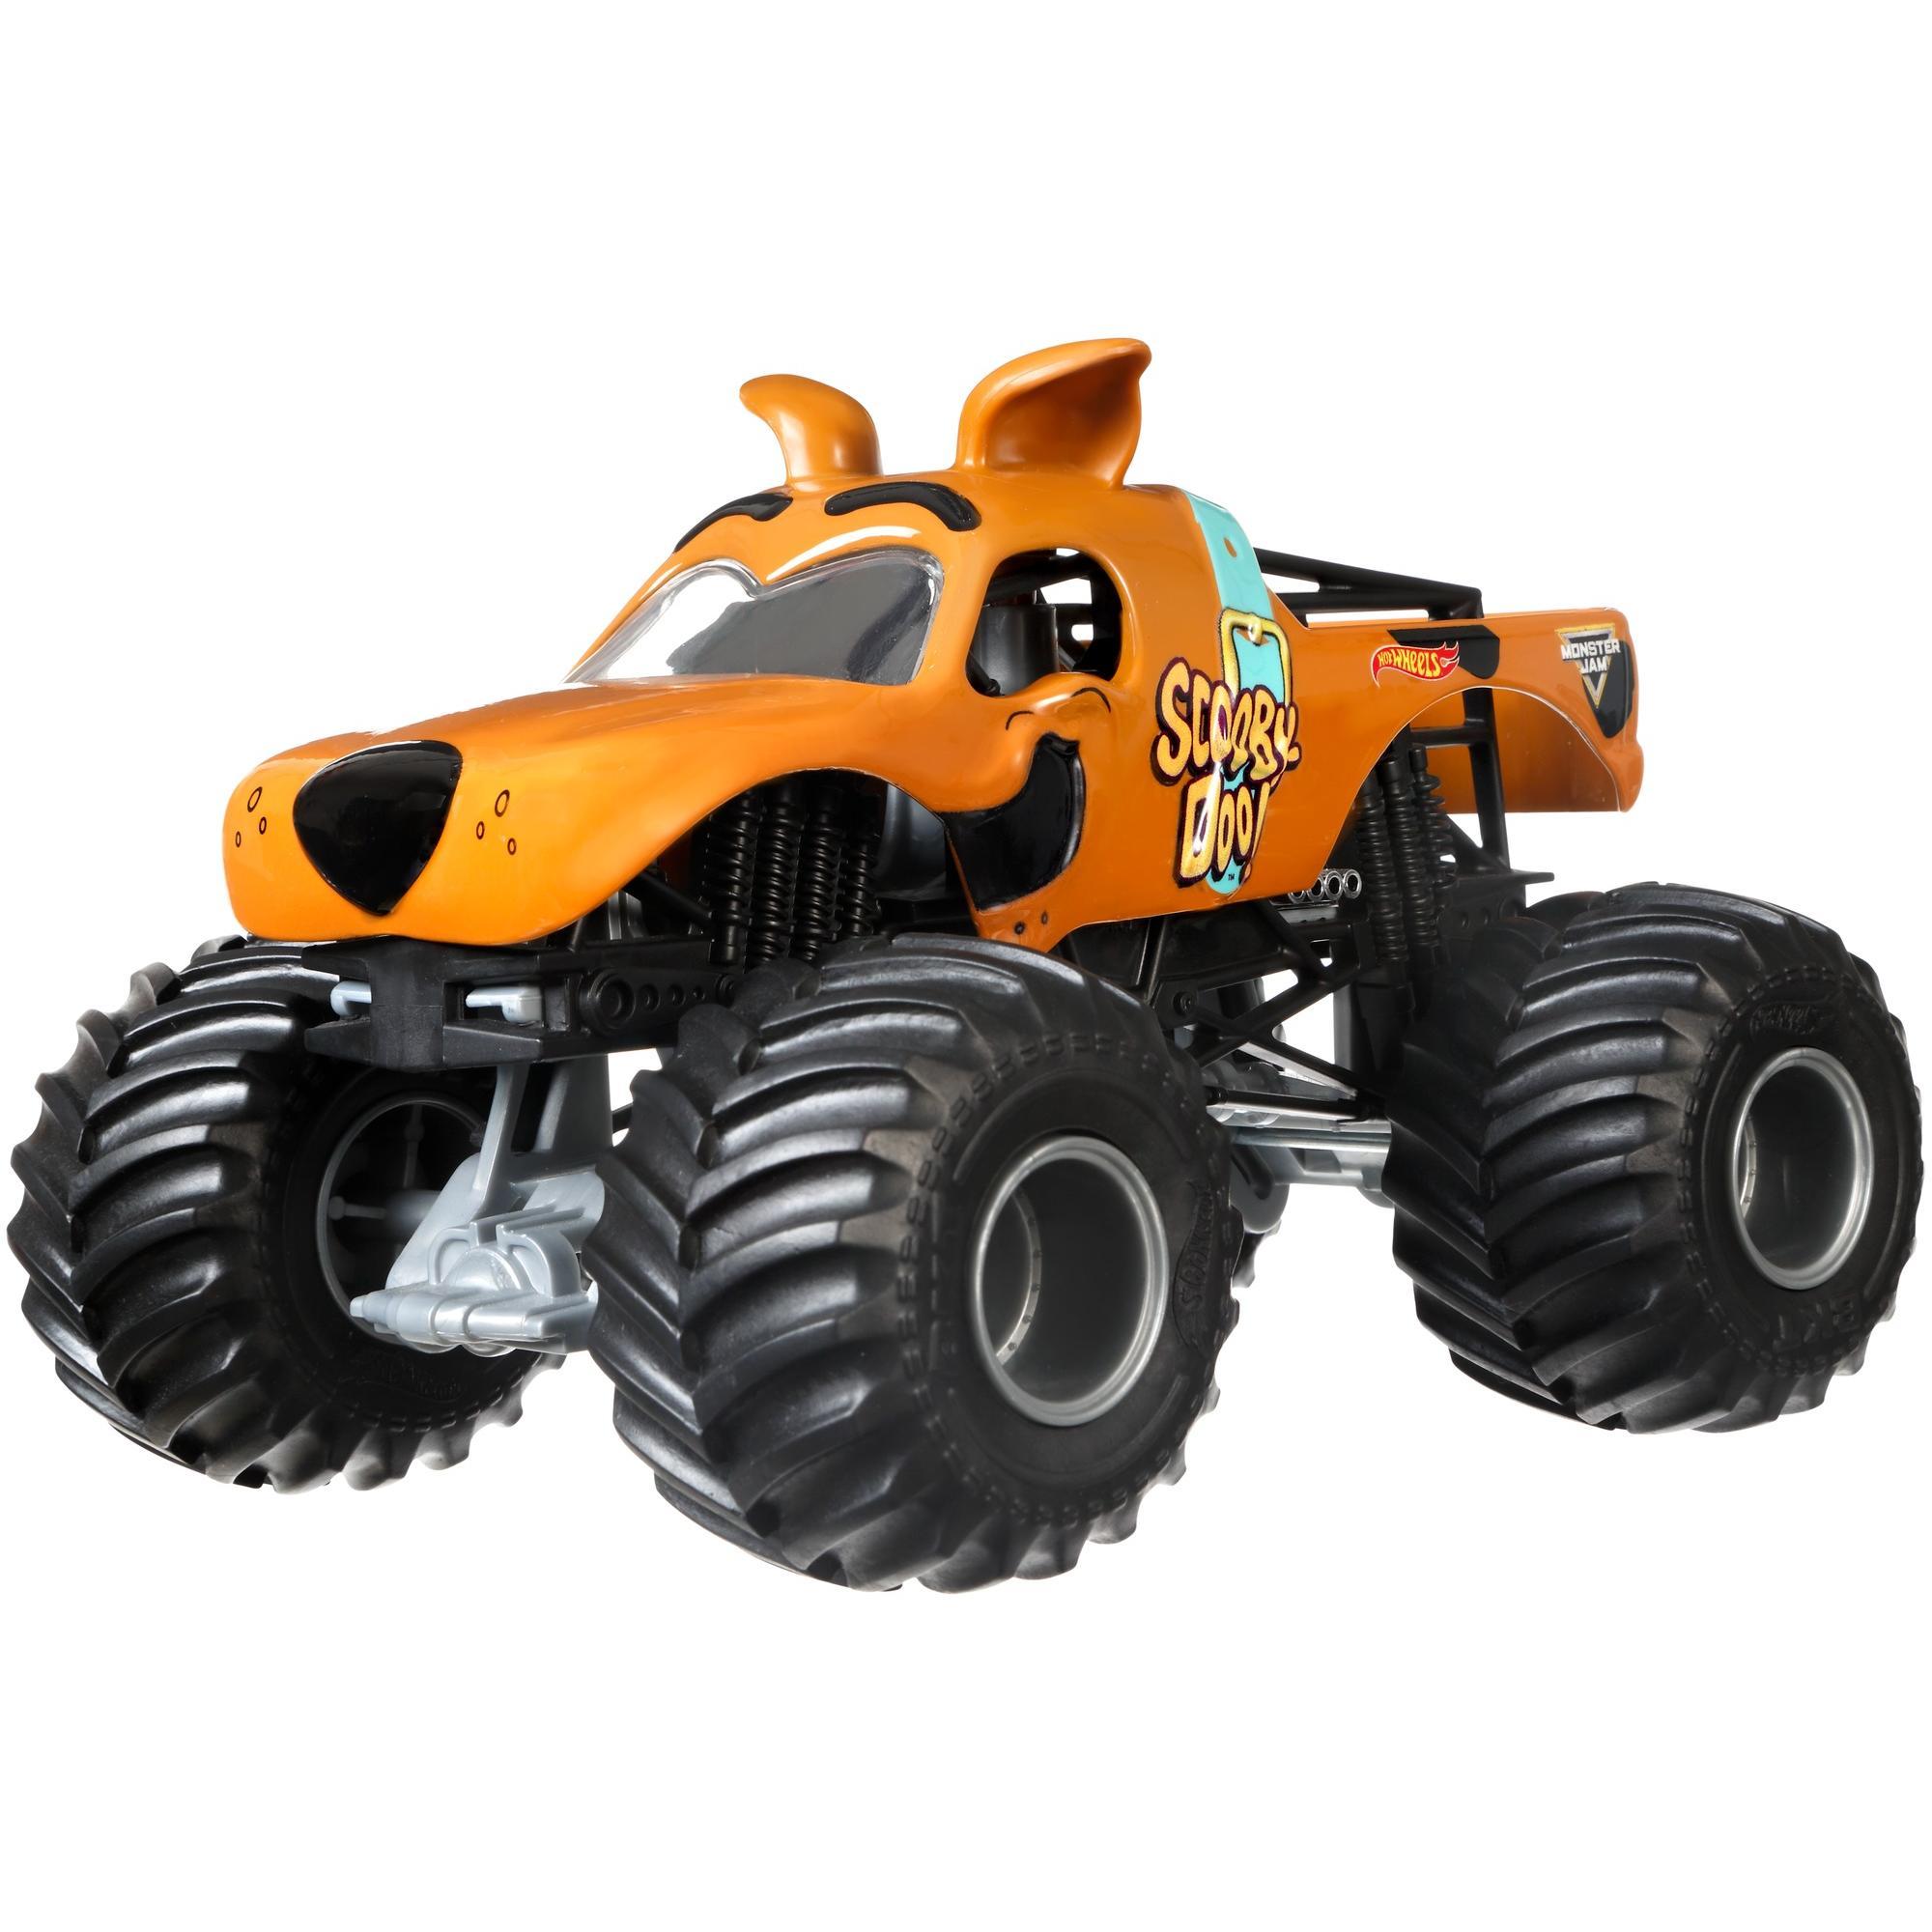 Hot Wheels Monster Jam 1:24 Vehicle (Styles May Vary)